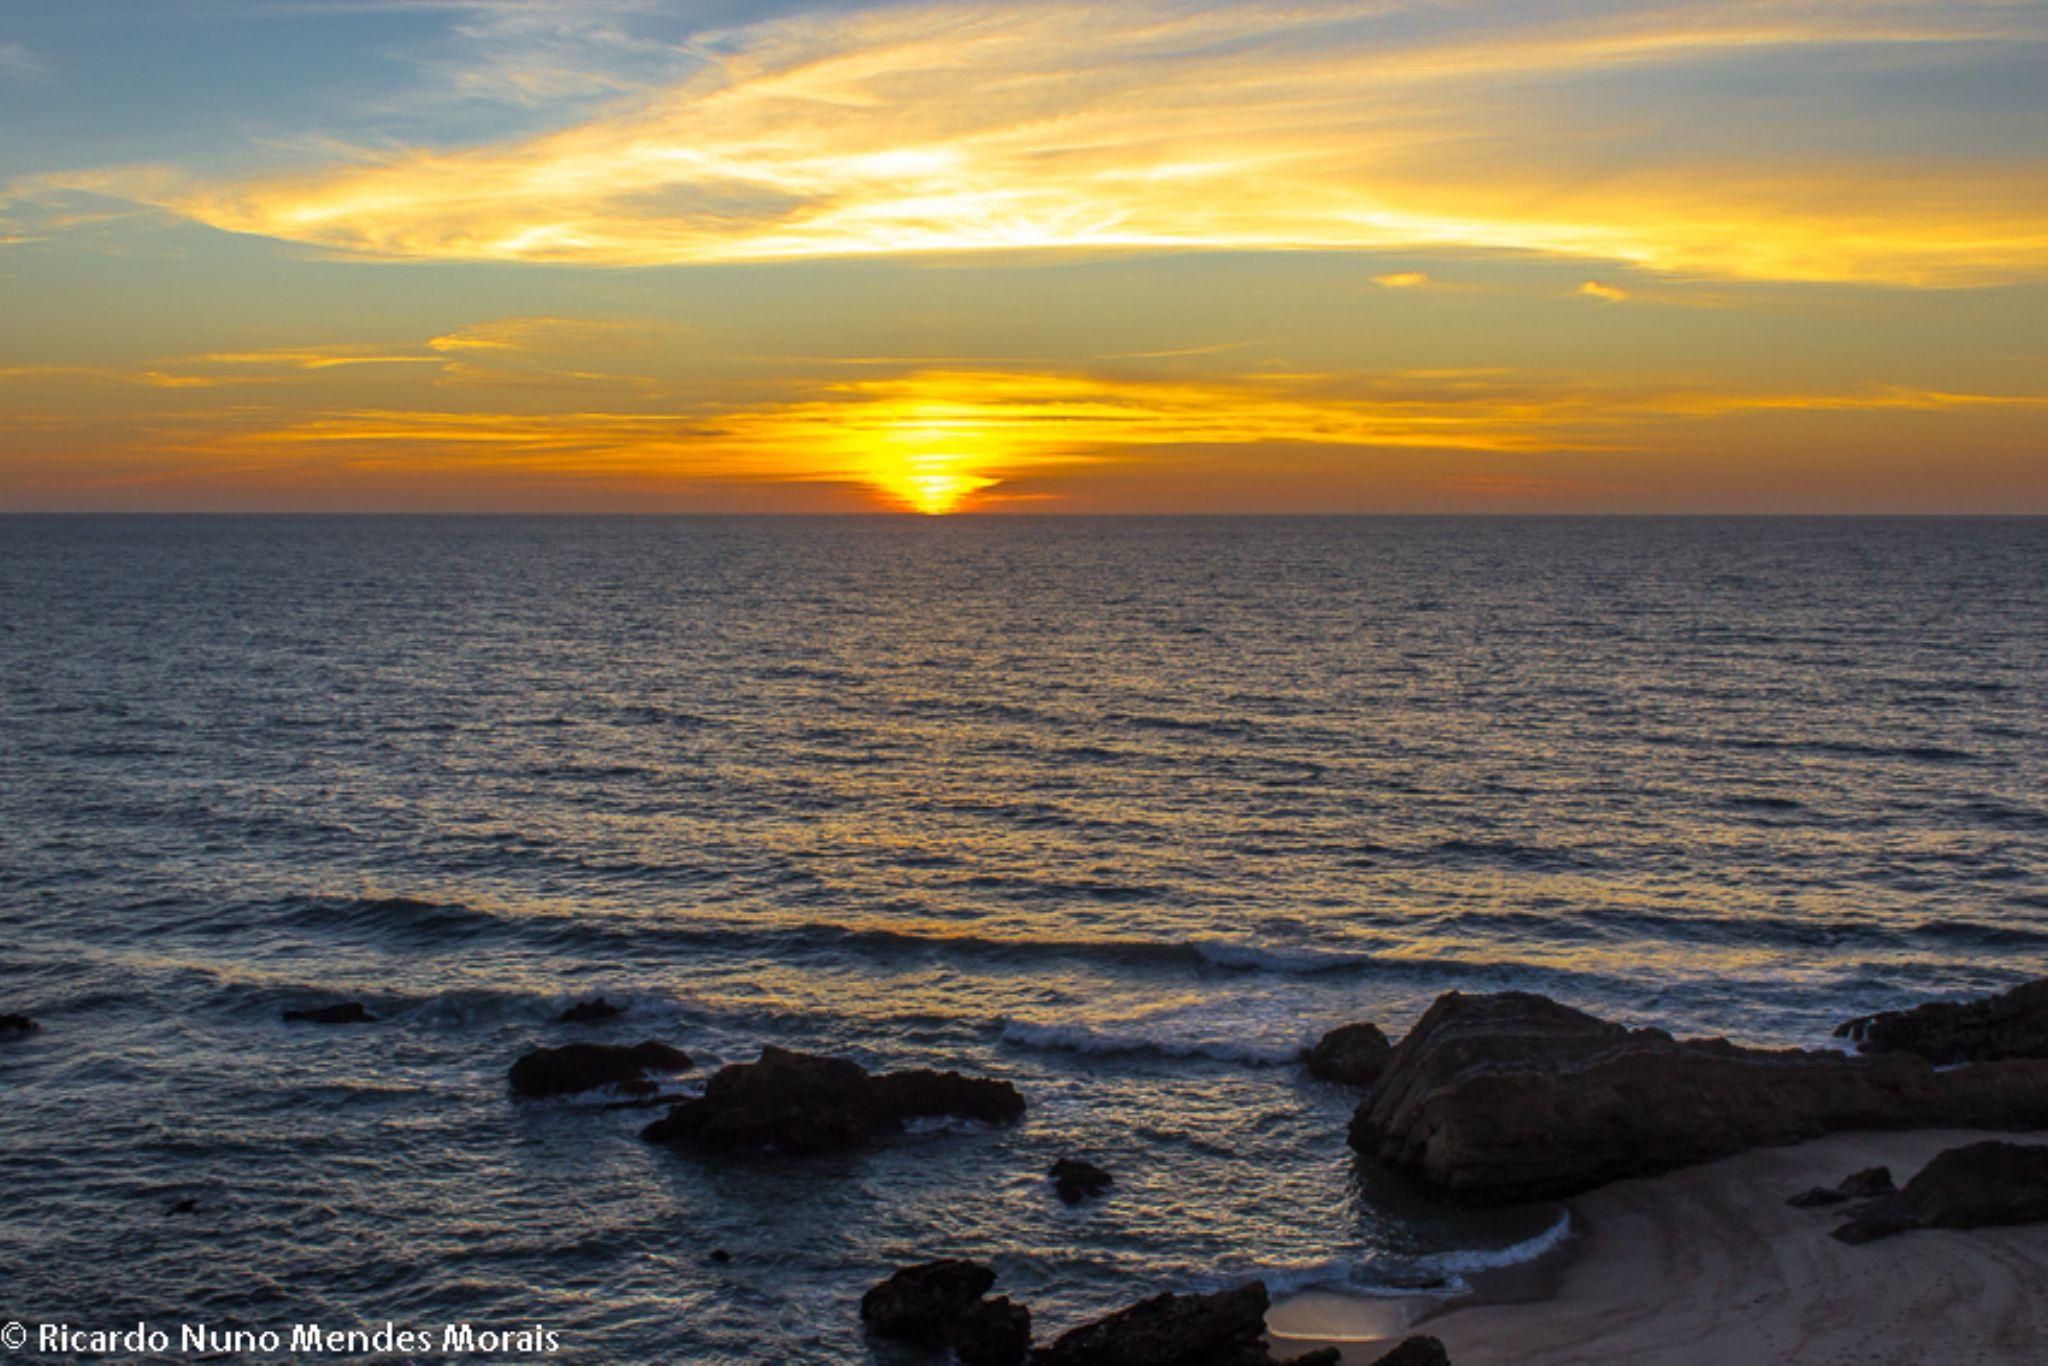 Sunset by Ricardo Nuno Mendes Morais